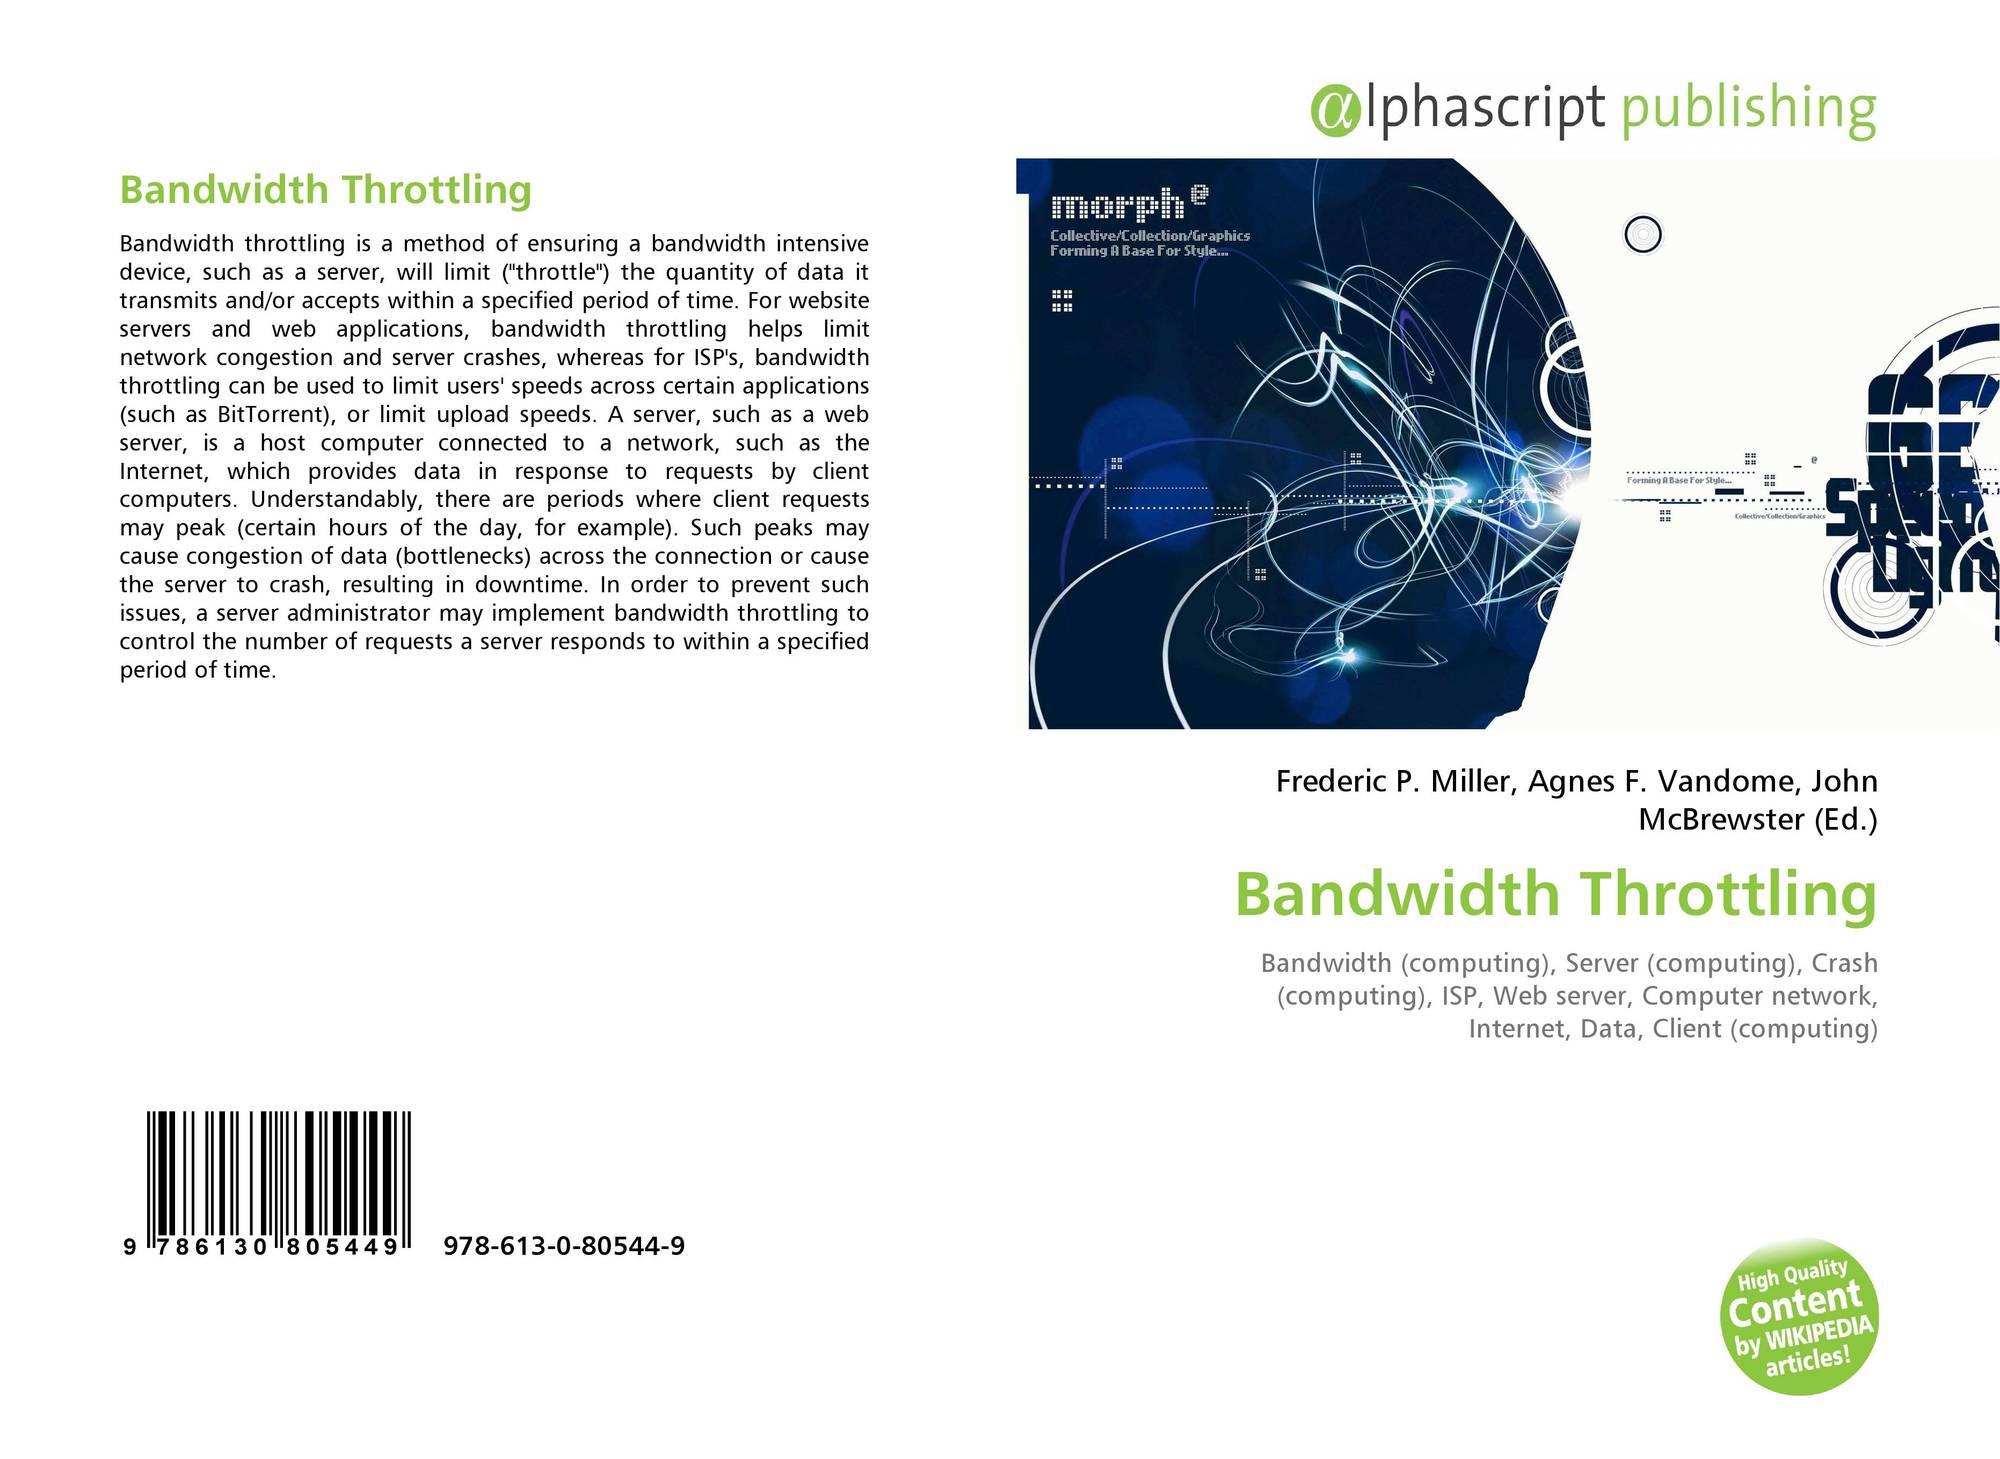 Bandwidth Throttling, 978-613-0-80544-9, 6130805446